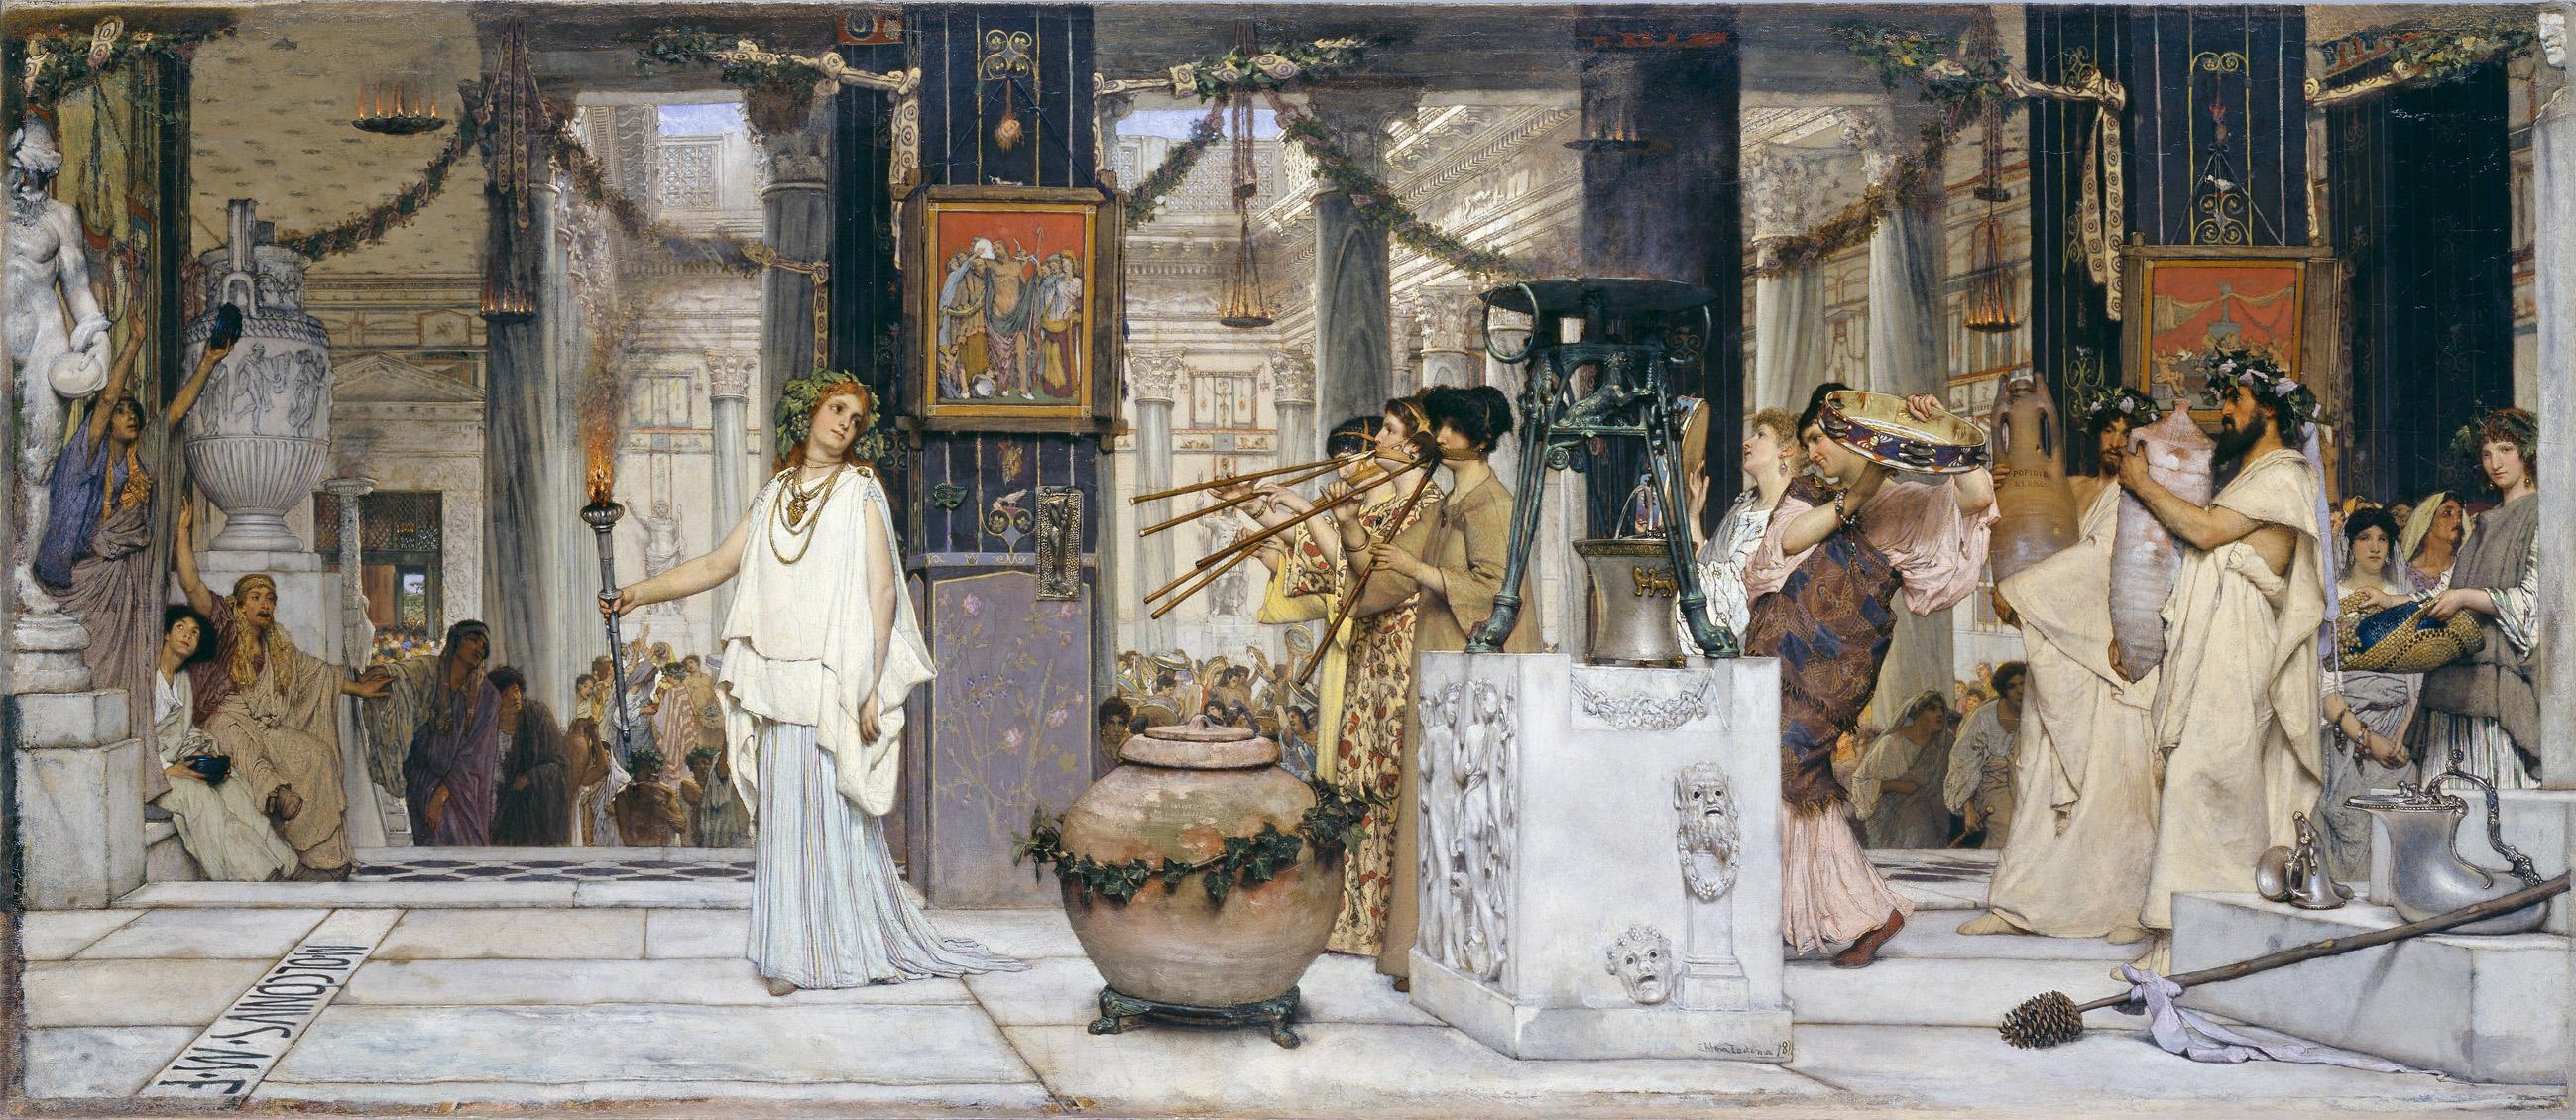 Lawrence Alma-Tadema (1836–1912) Das Fest der Weinlese, 1871 Öl auf Leinwand, 77 x 177 cm © Hamburger Kunsthalle / bpk Foto: Elke Walford